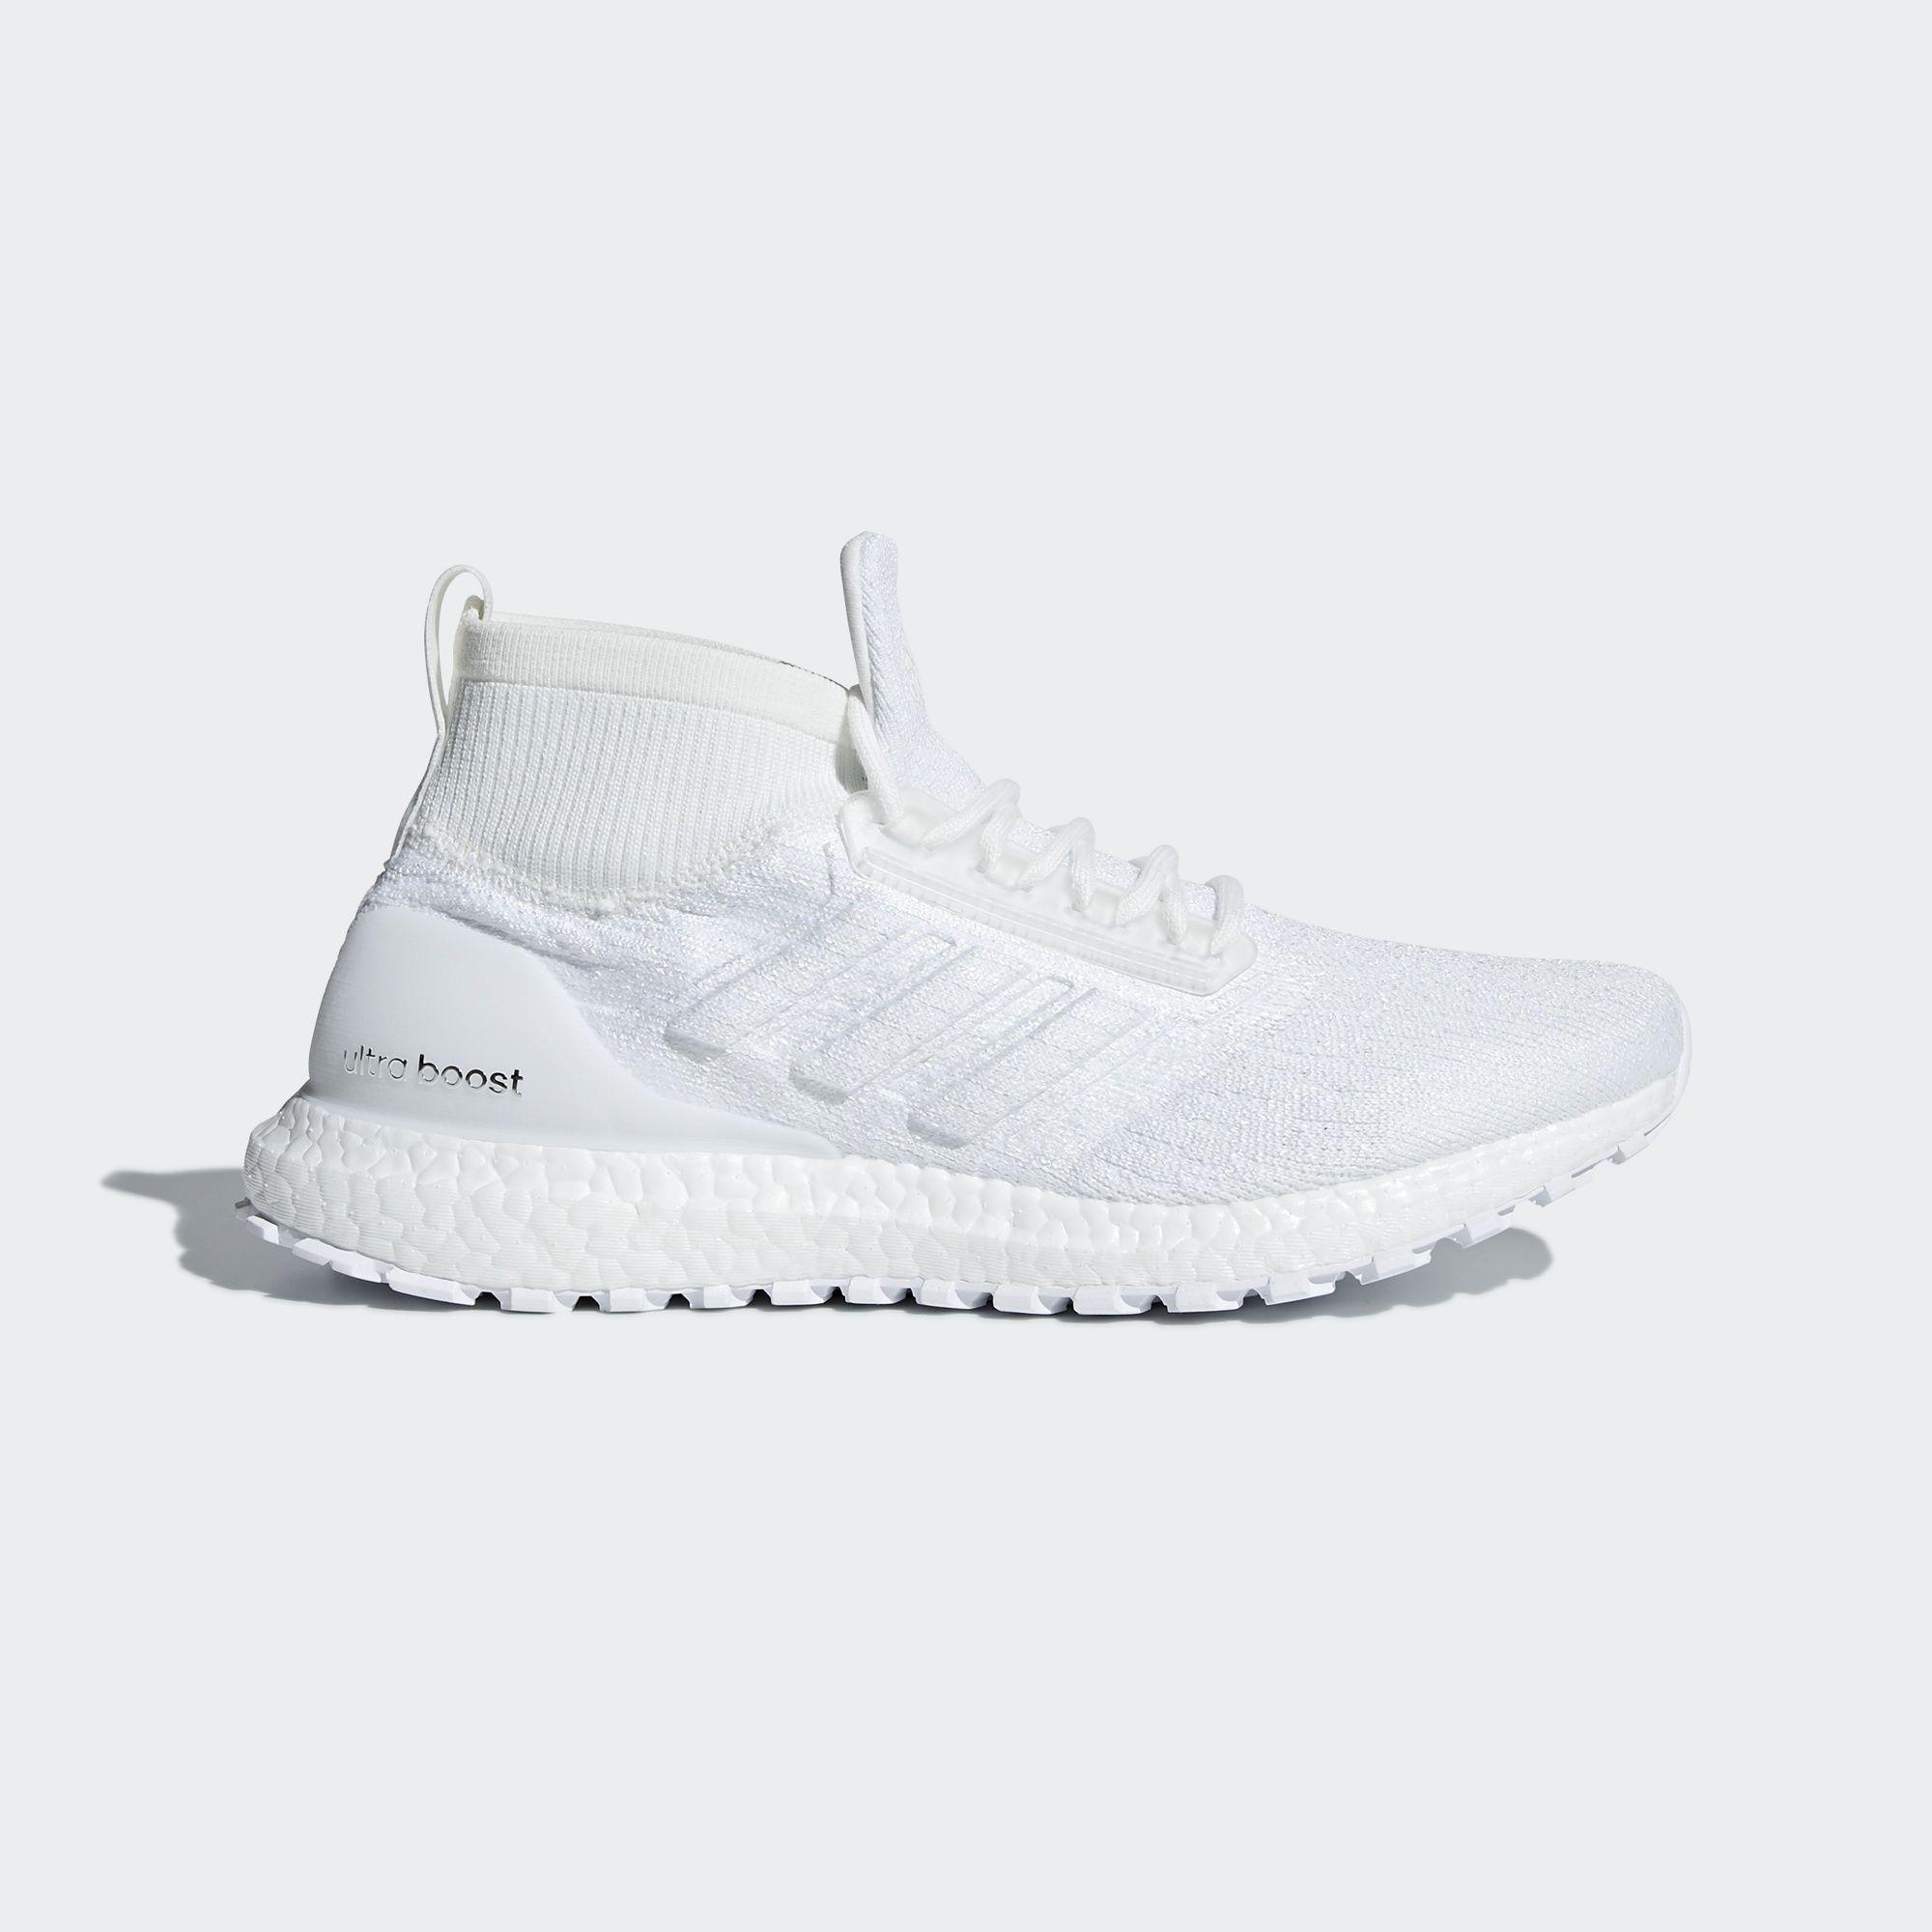 Adidas Ultraboost All Terrain Shoes White Adidas Us Sneakers Adidas Ultra Boost Running Shoes For Men